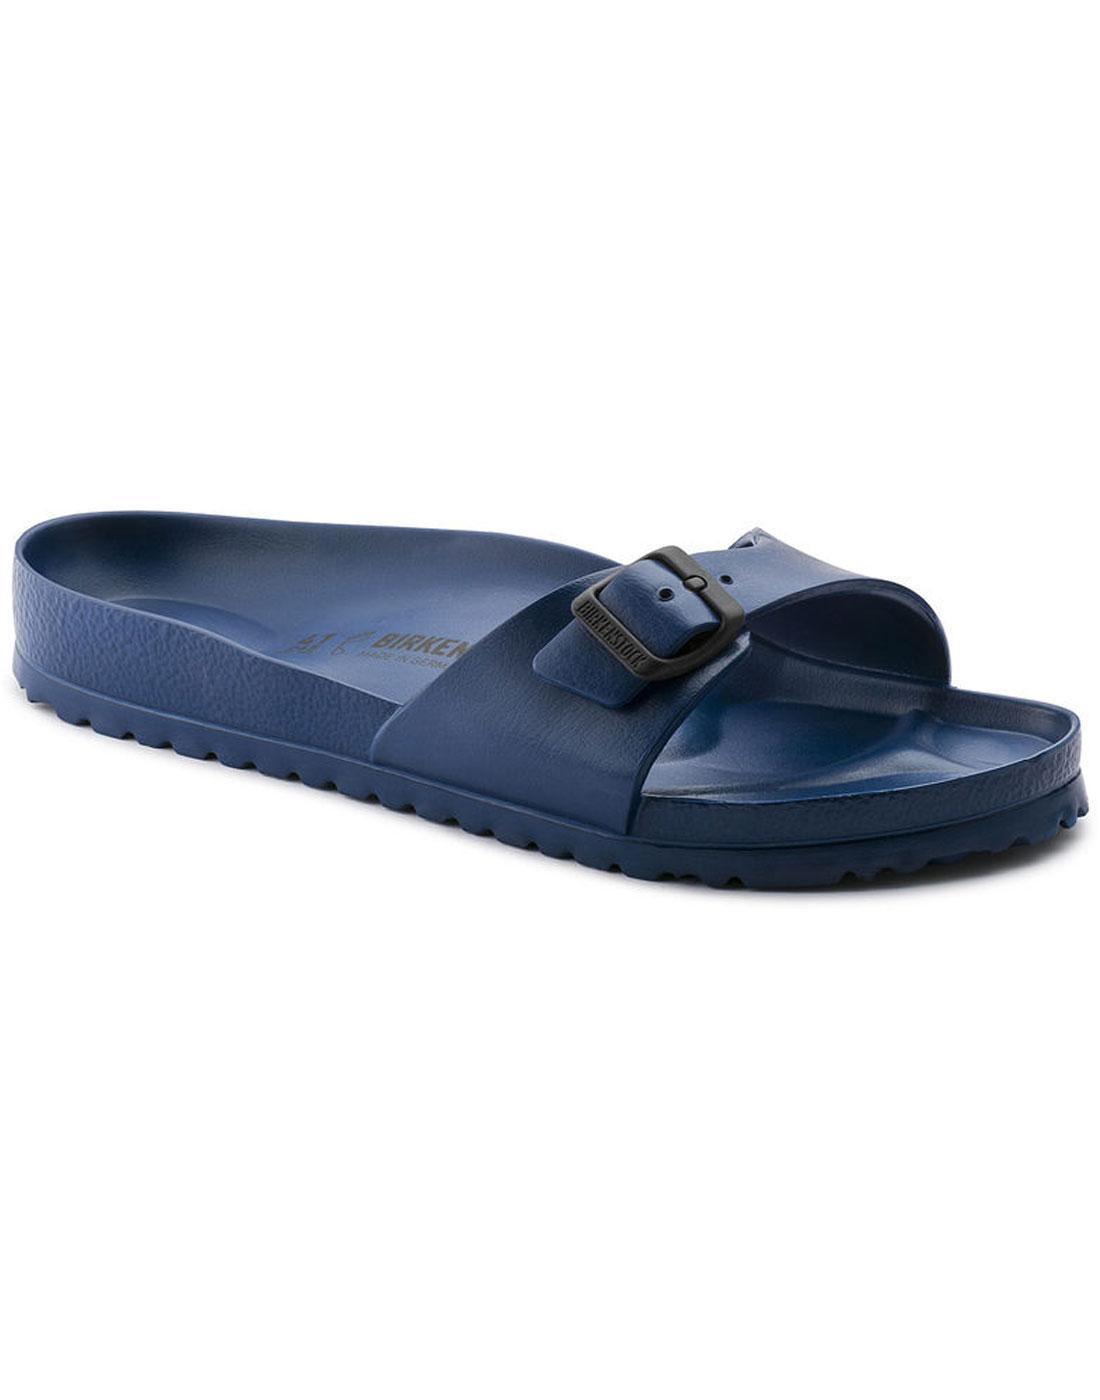 Madrid EVA BIRKENSTOCK Women's 1 Strap Sandals (N)